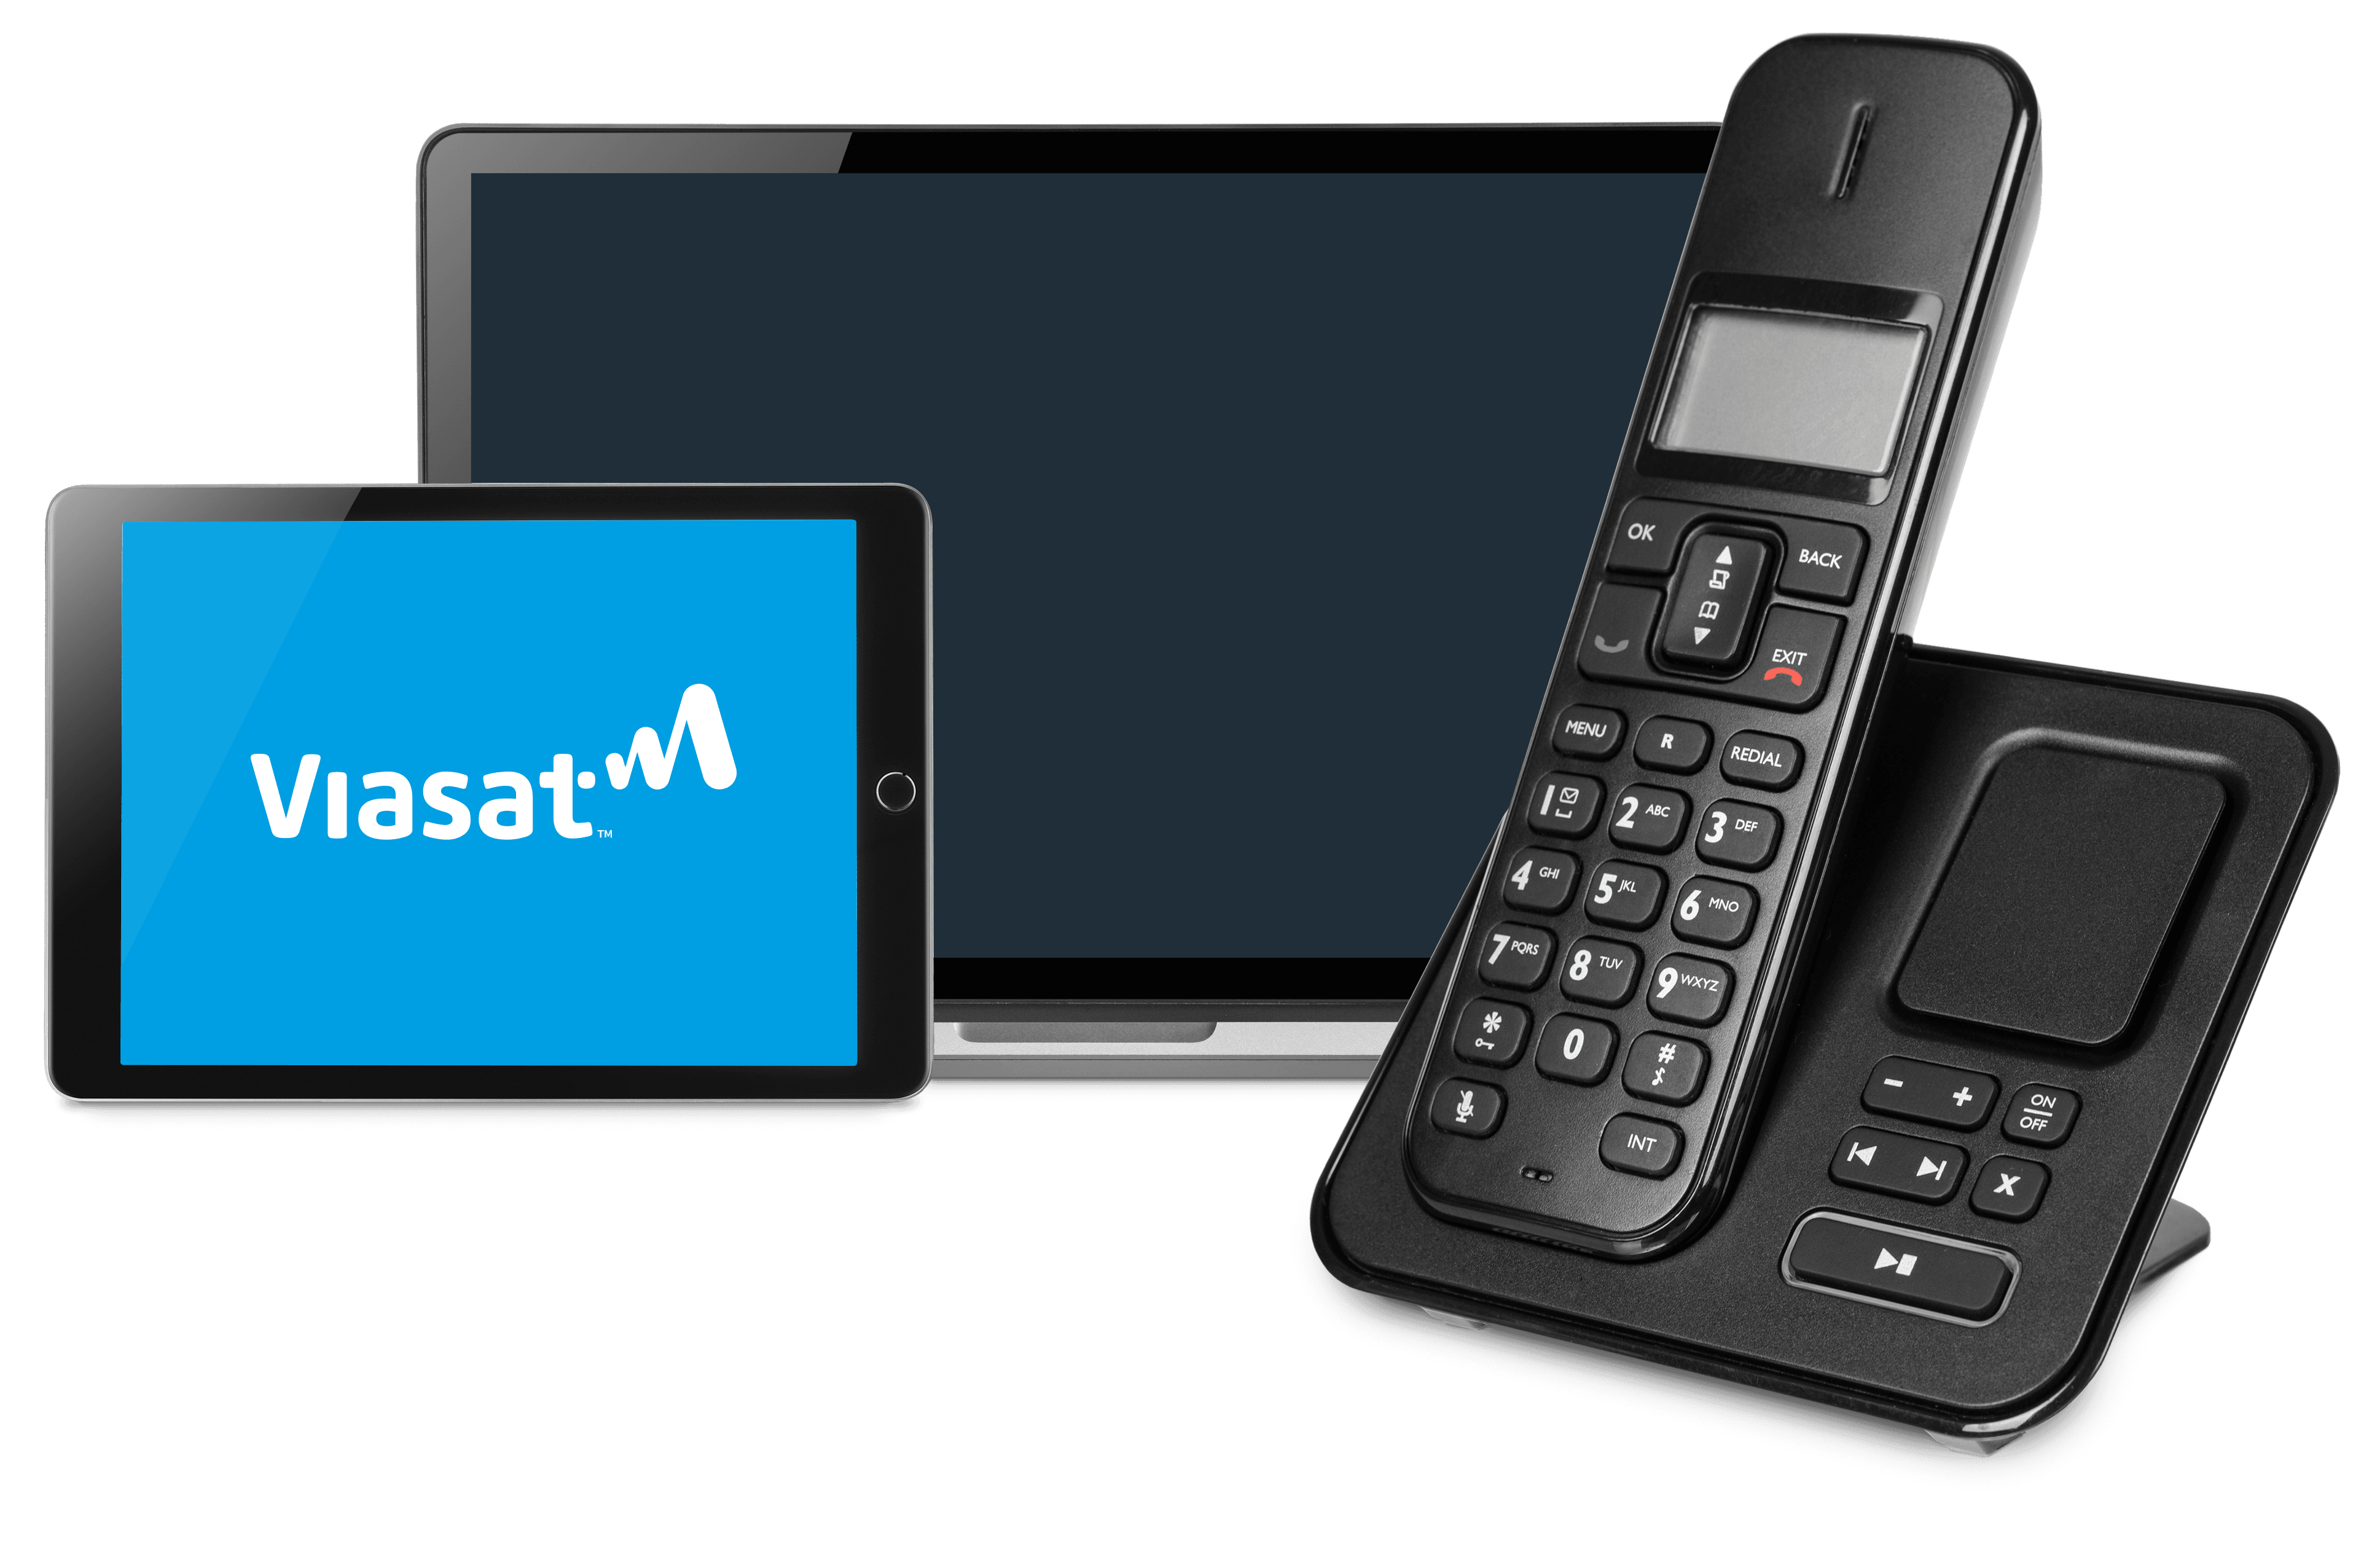 Viasat VoiP Phone